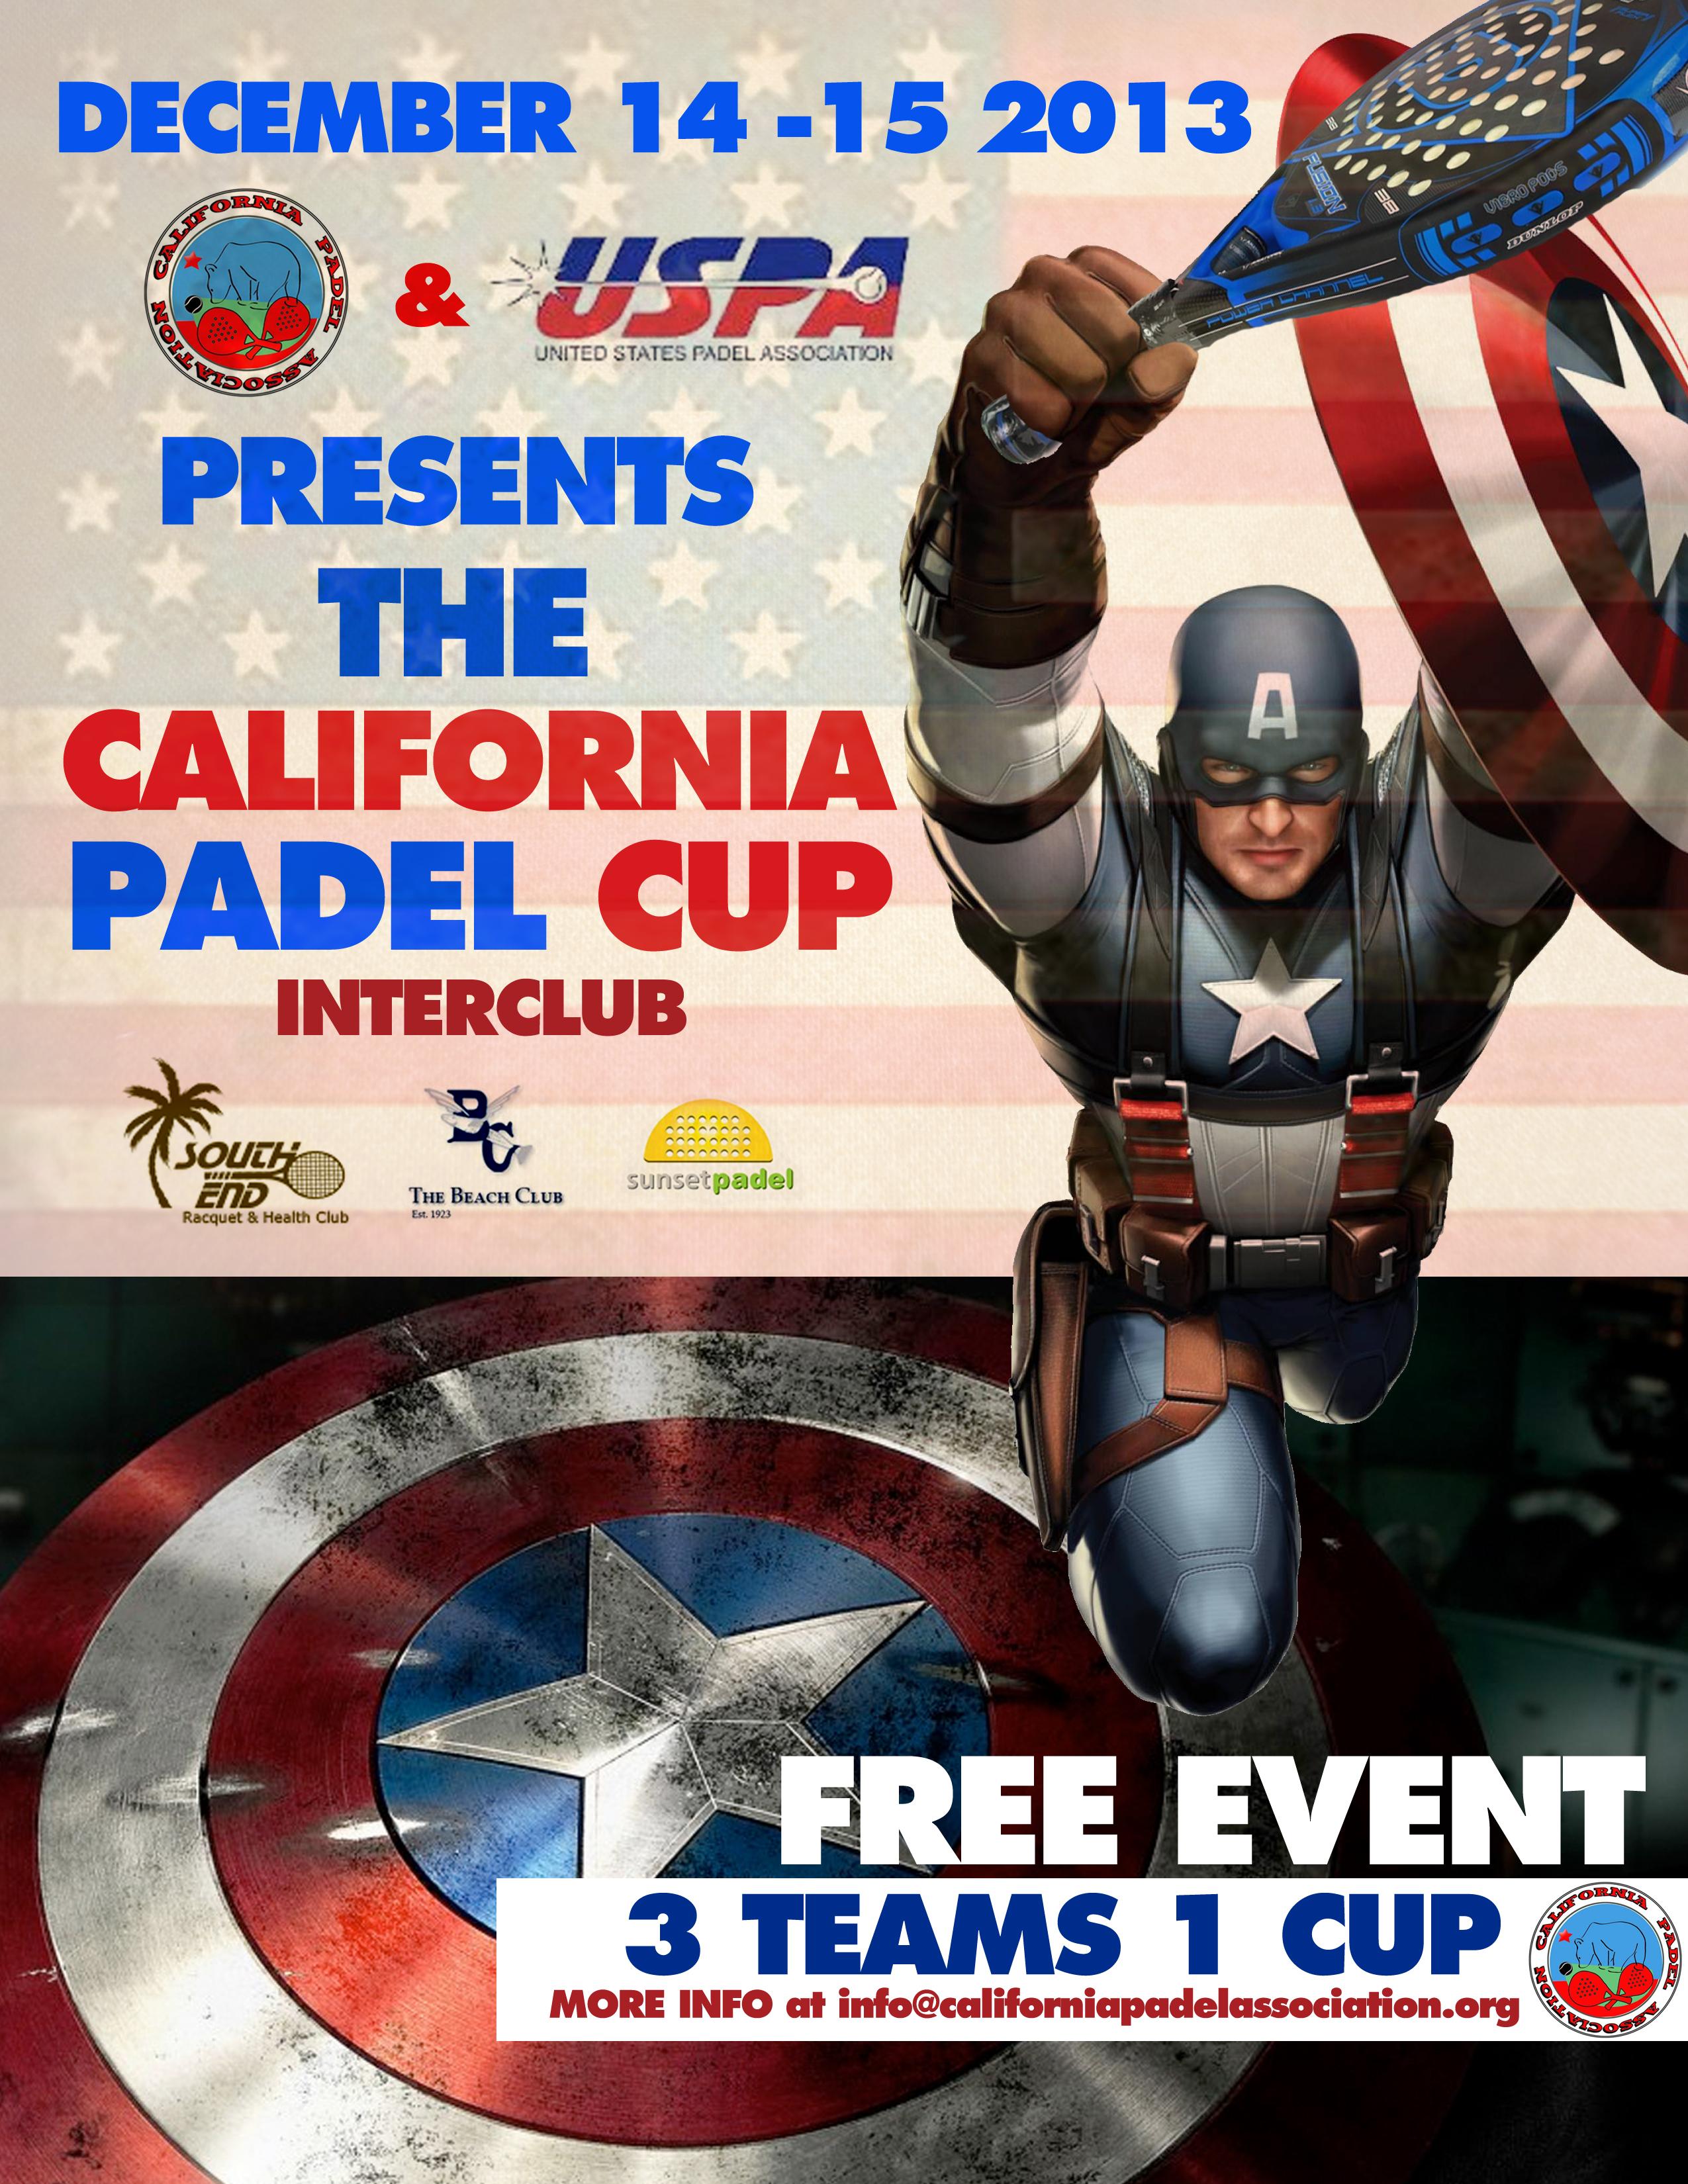 CALIFORNIA CUP PADELBOX